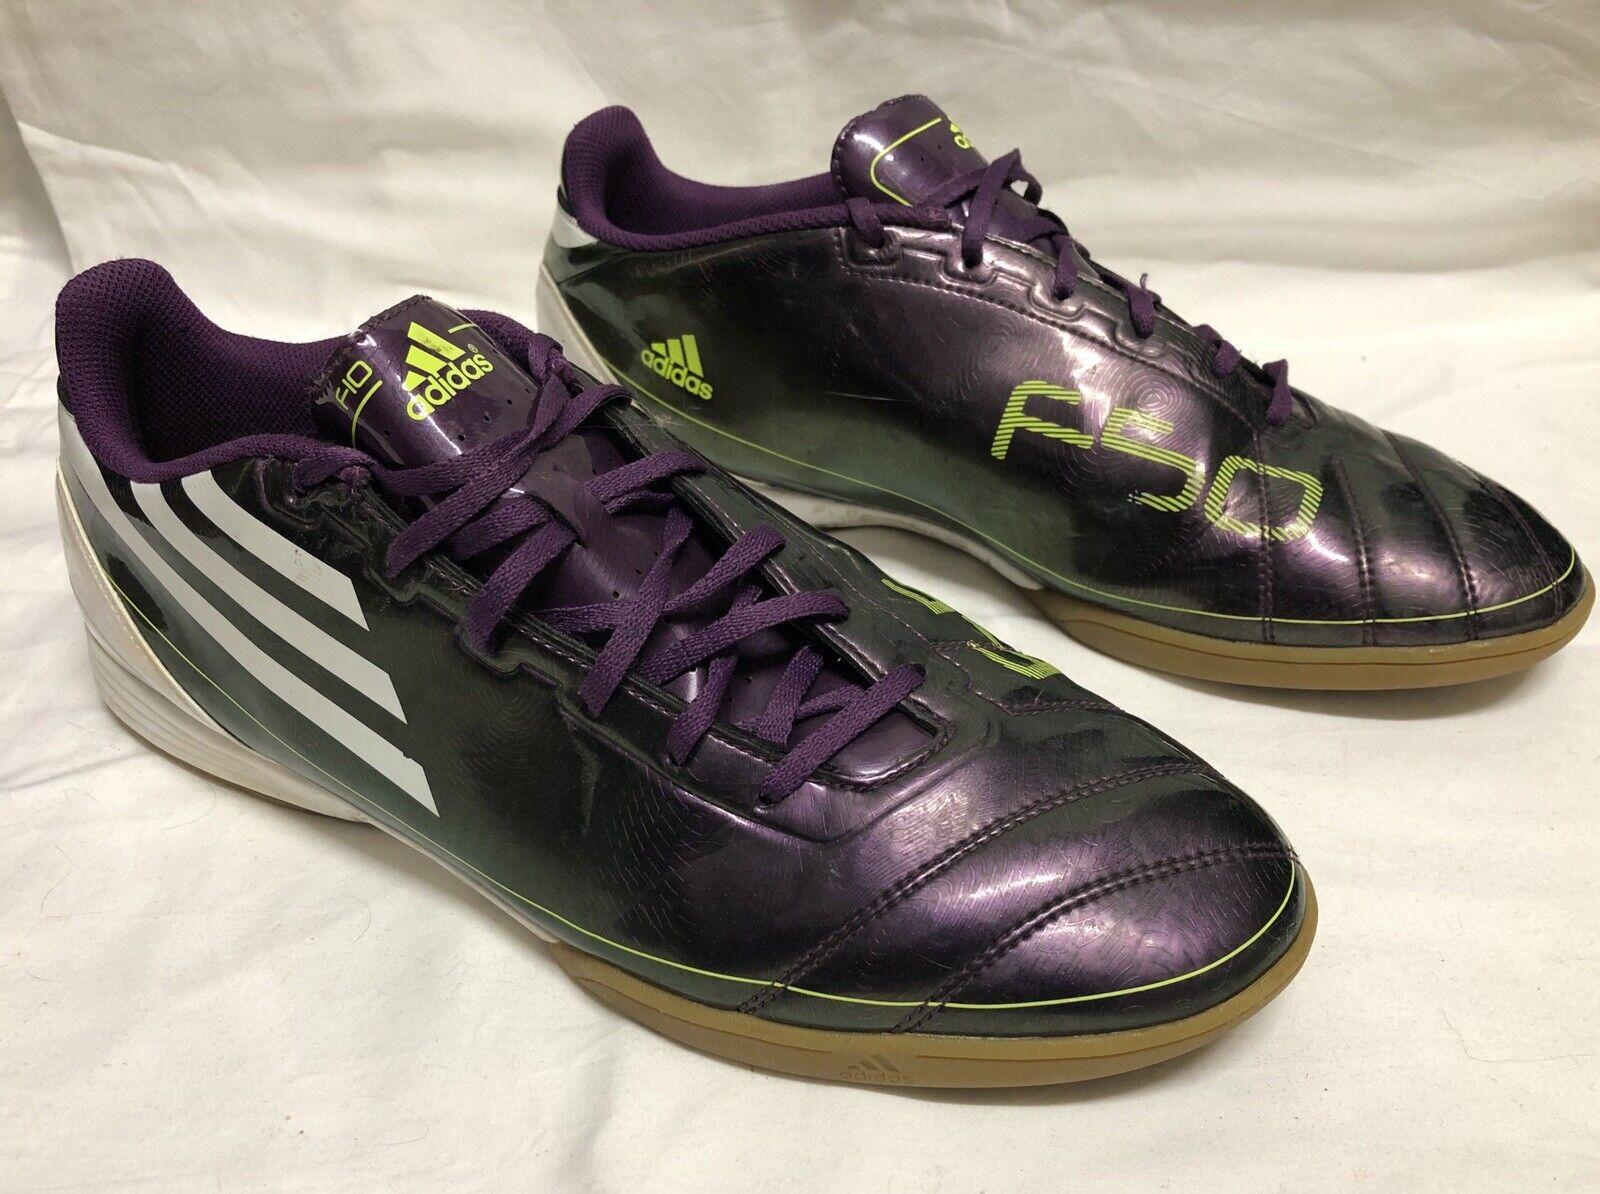 Adidas Adizero F50 Futsal Fútbol Fútbol botas De Interior EE. UU. 11 1 2